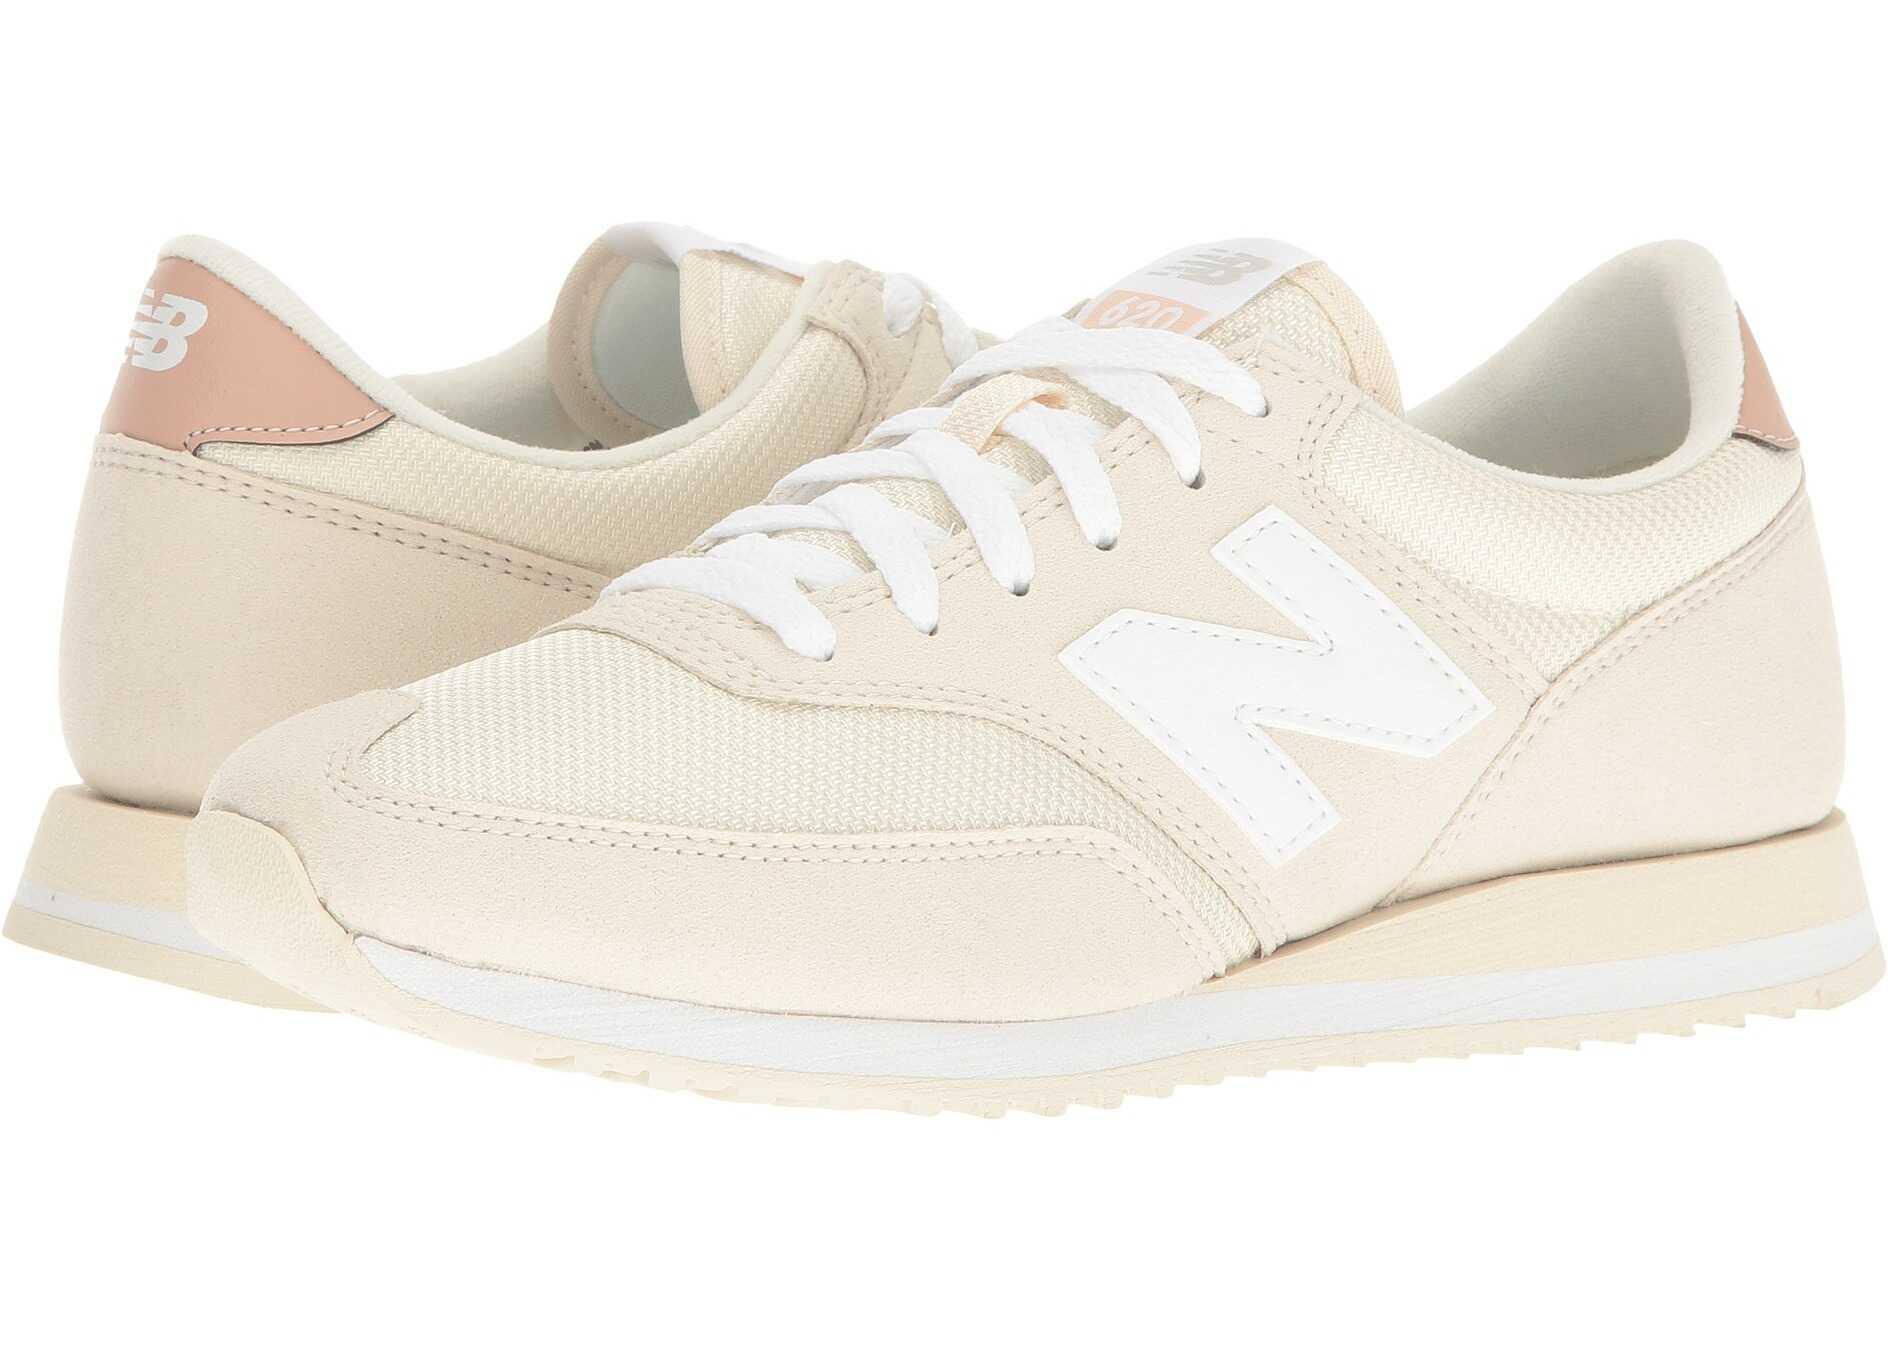 New Balance Classics CW620 White Asparagus/Pink